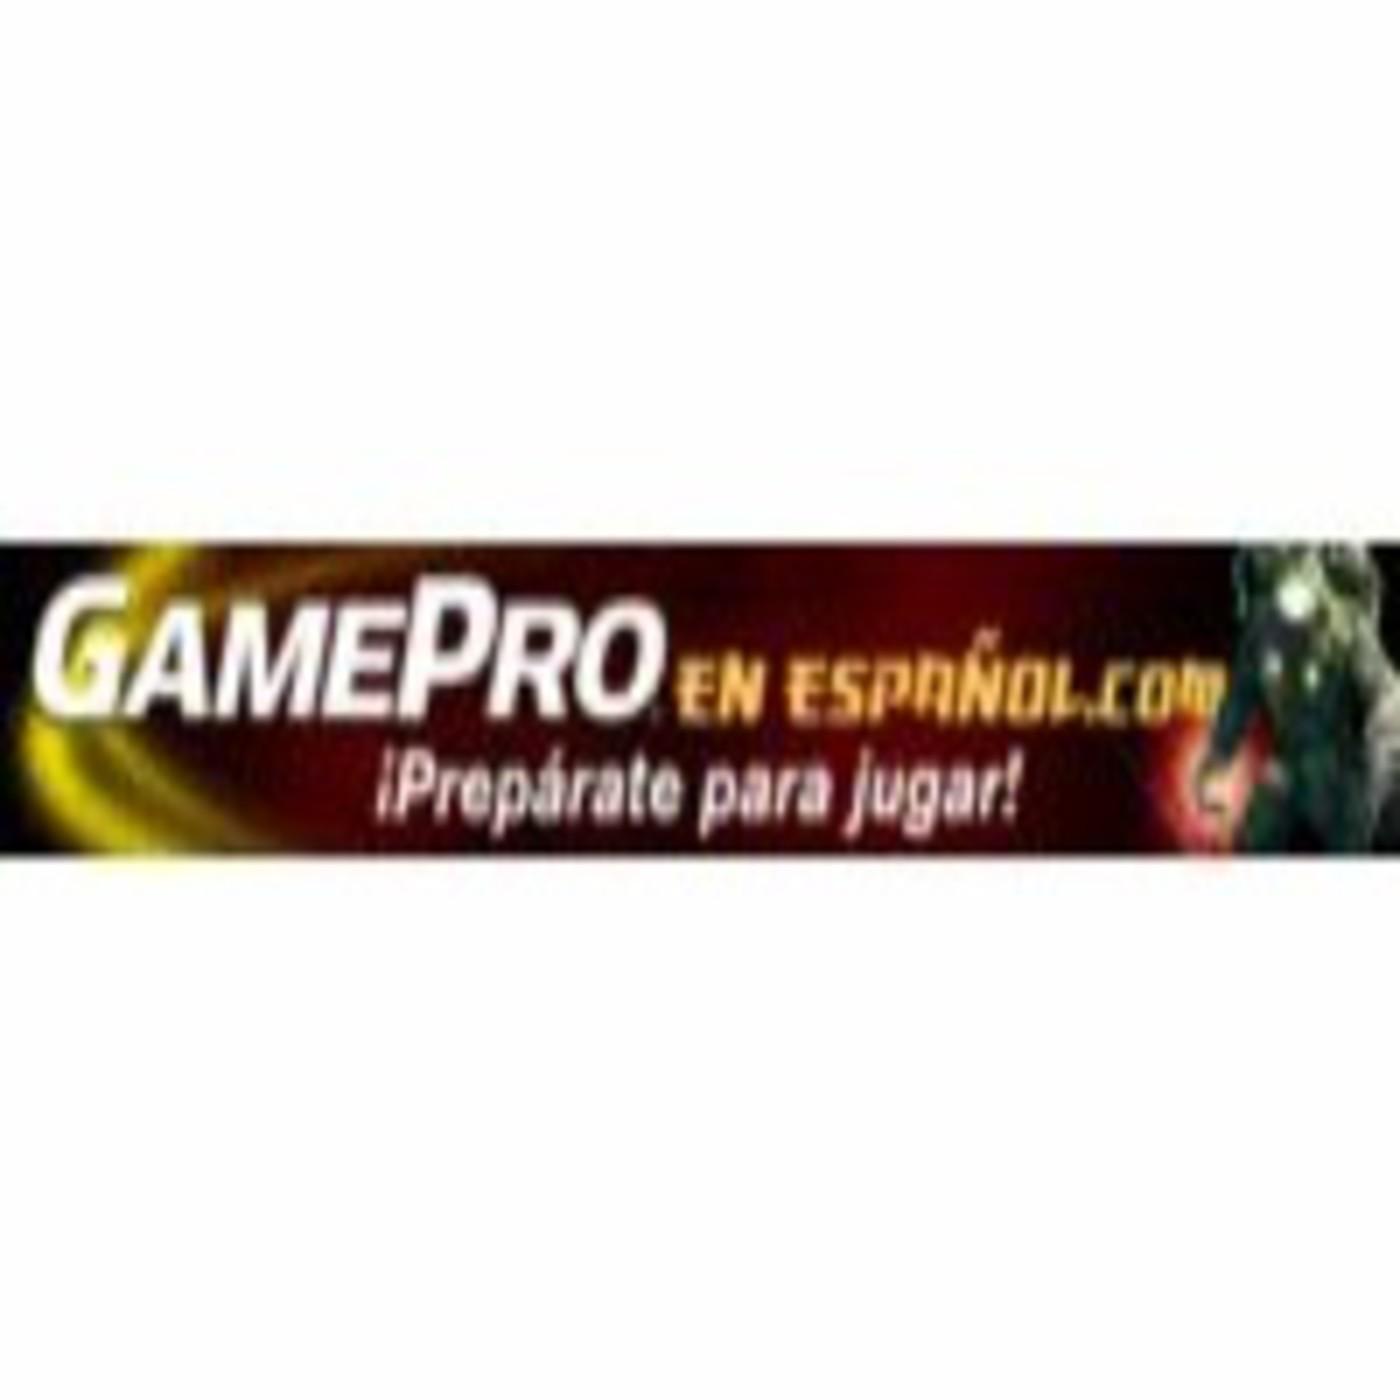 <![CDATA[Podcast GamePro en Español]]>